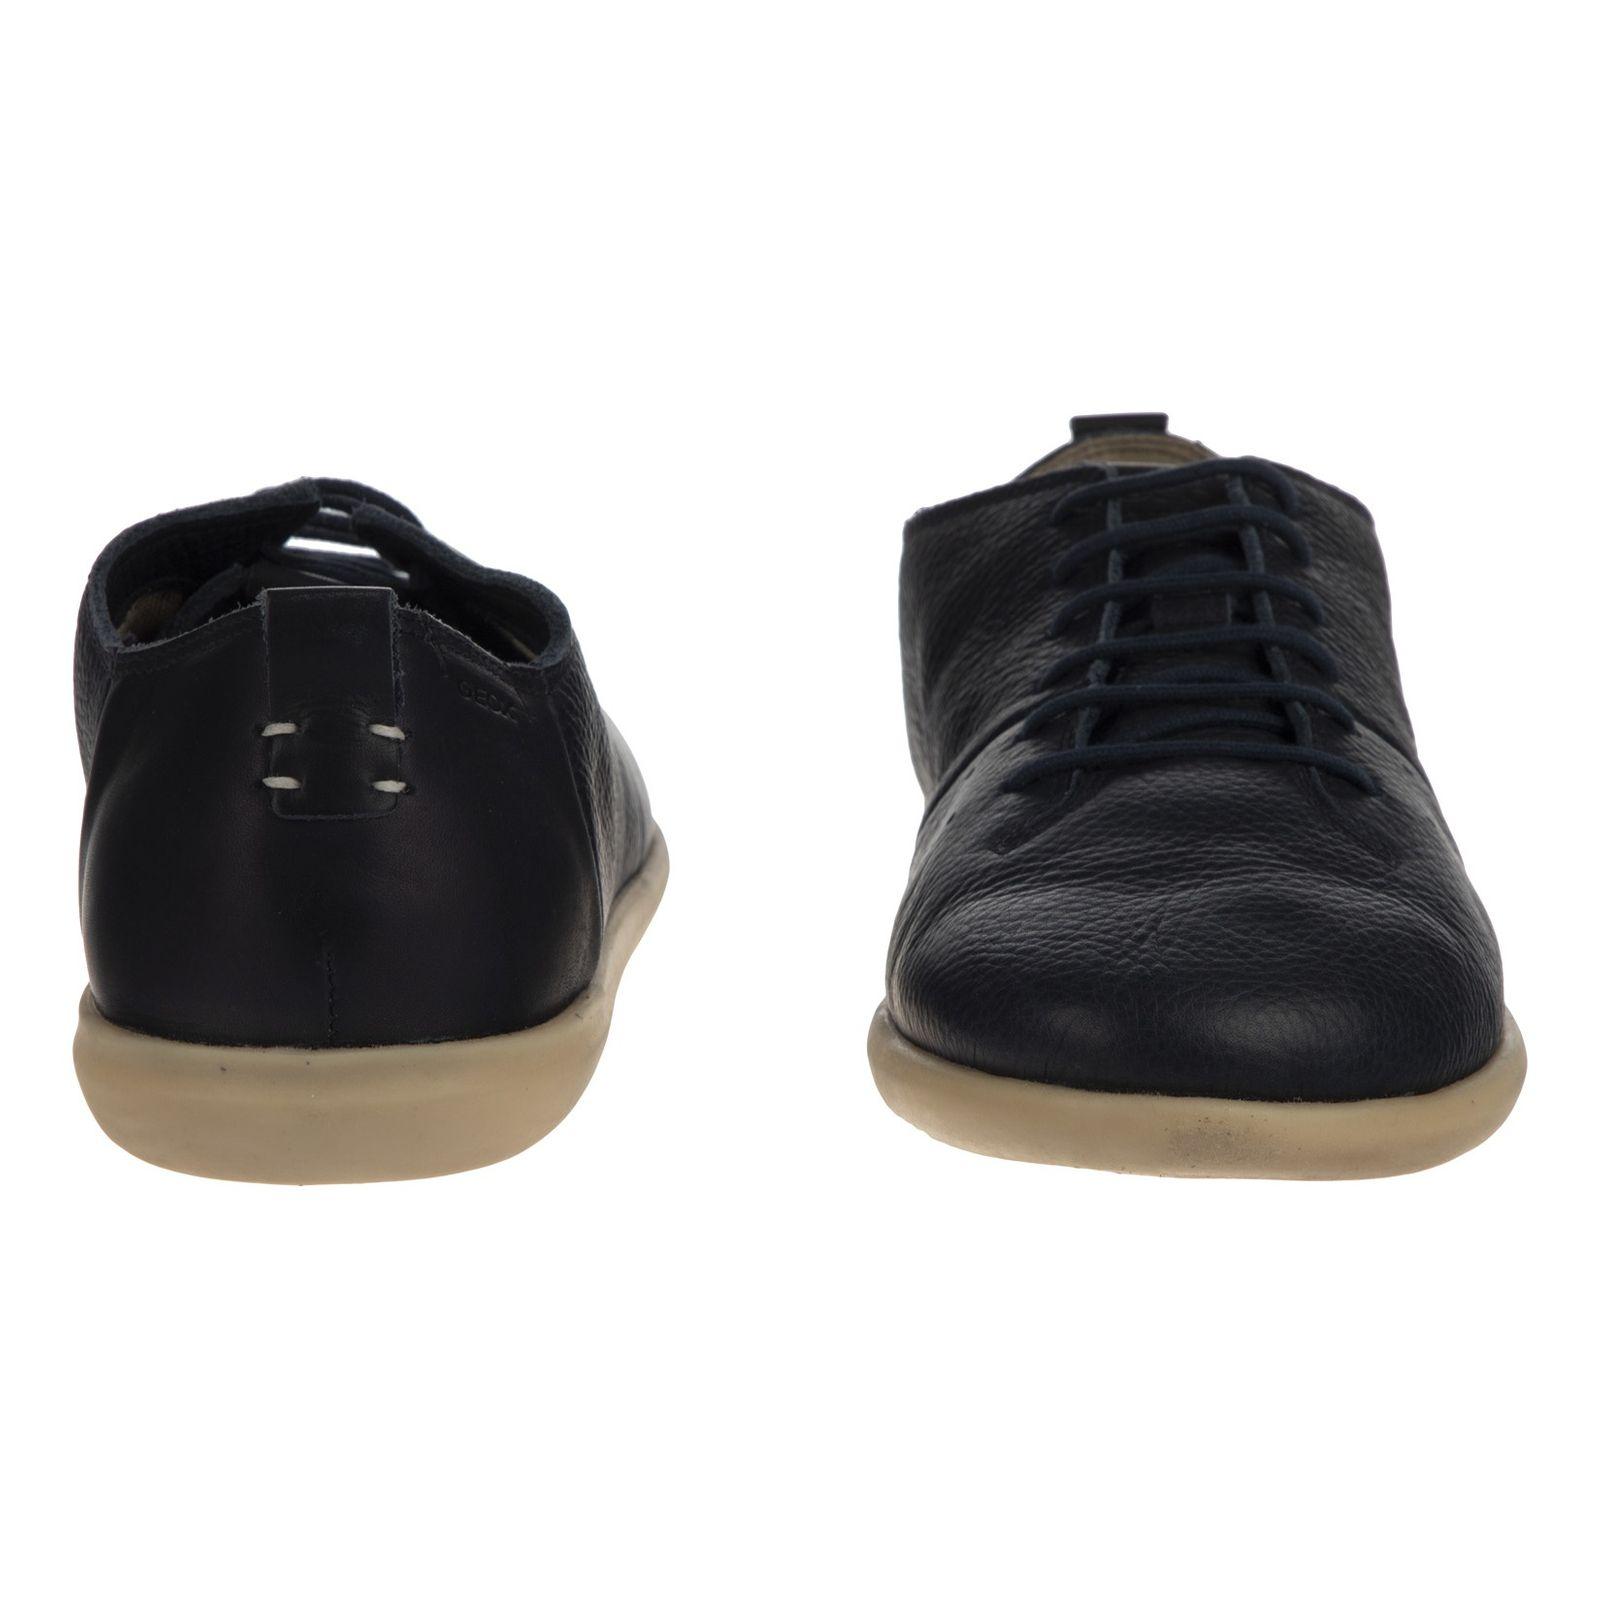 کفش روزمره مردانه جی اوکس مدل U620QB-04643-C4002 -  - 3